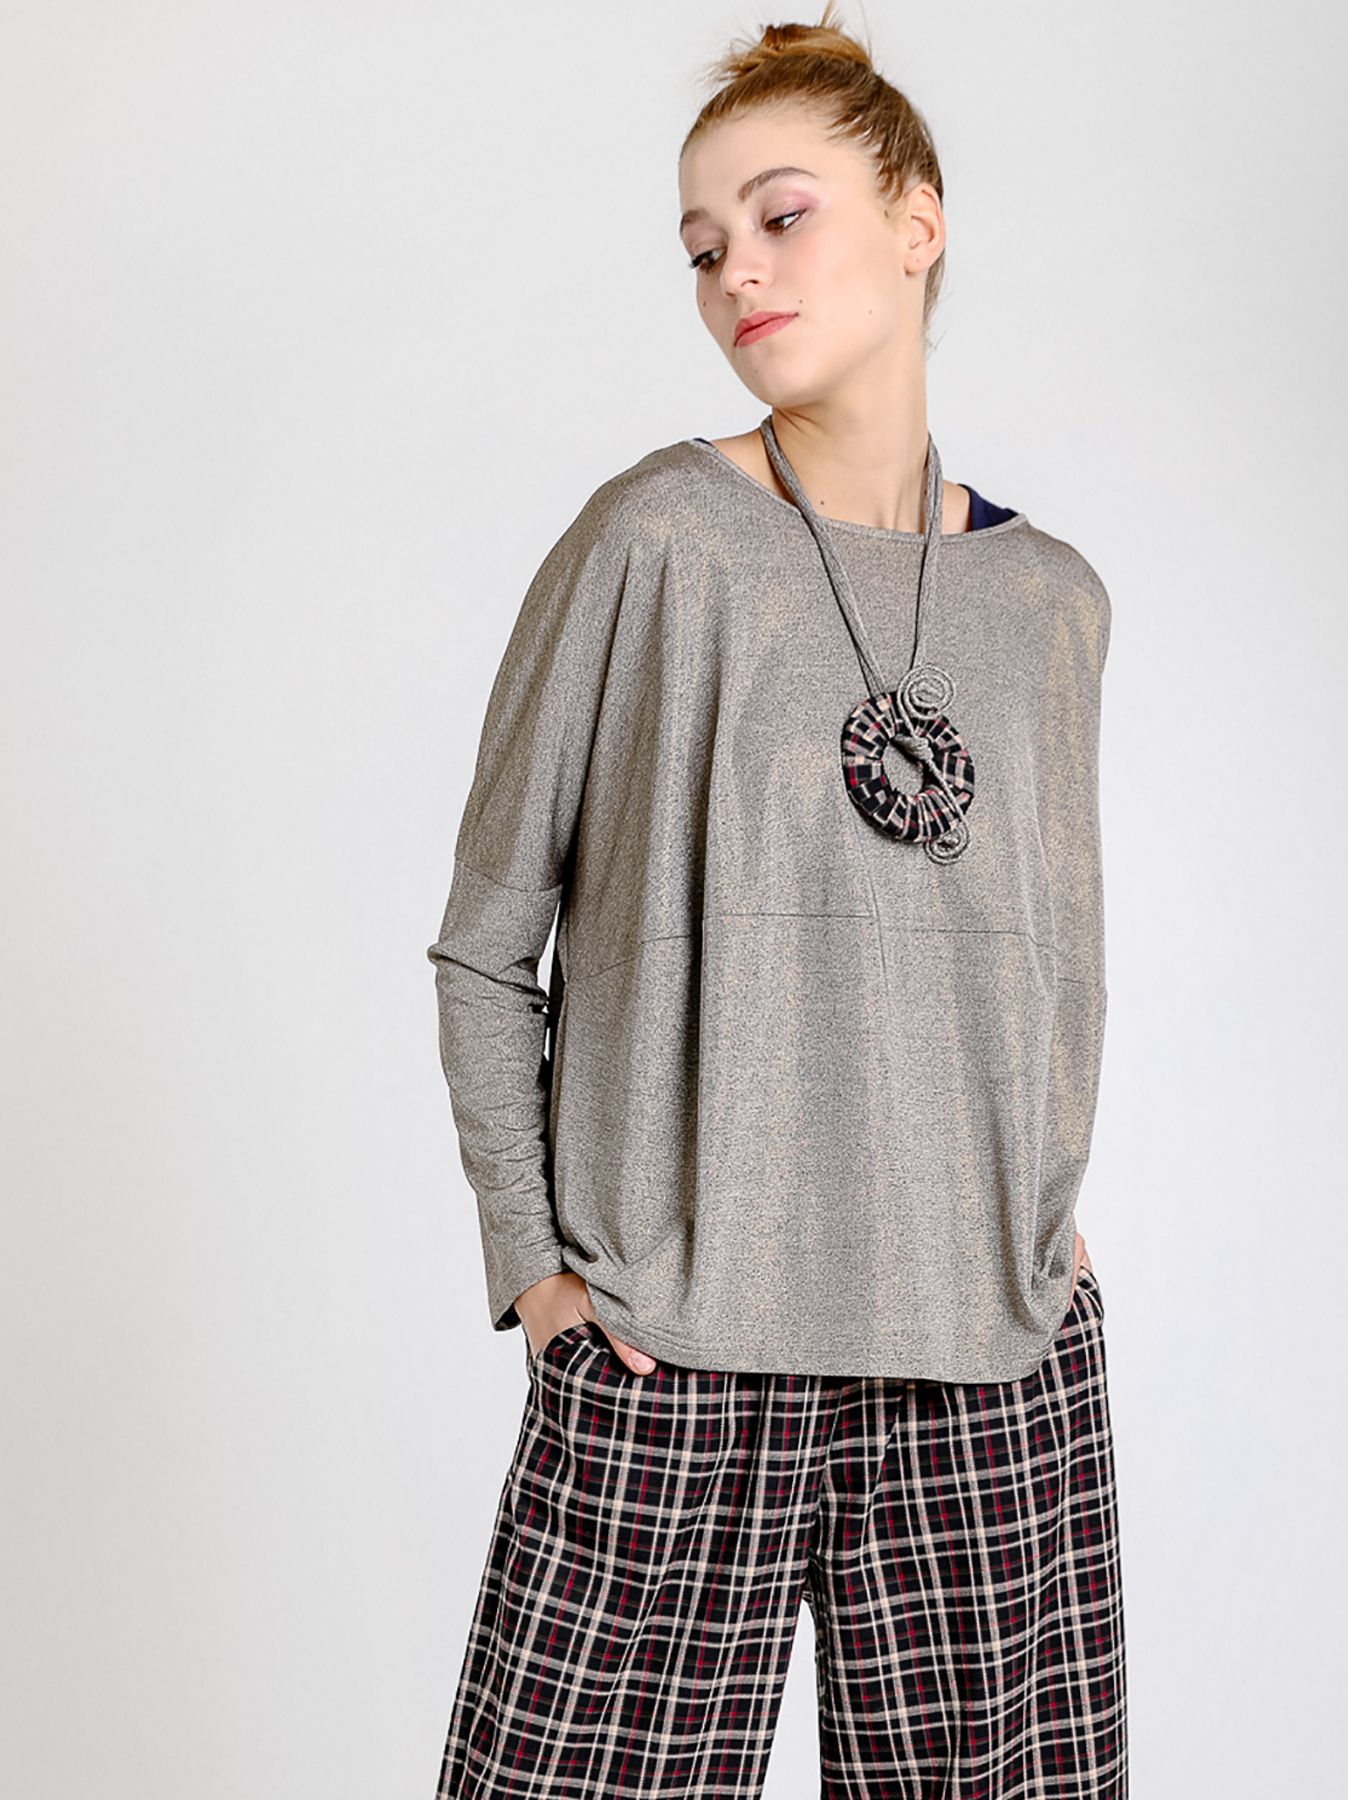 T-shirt ovetto in lurex